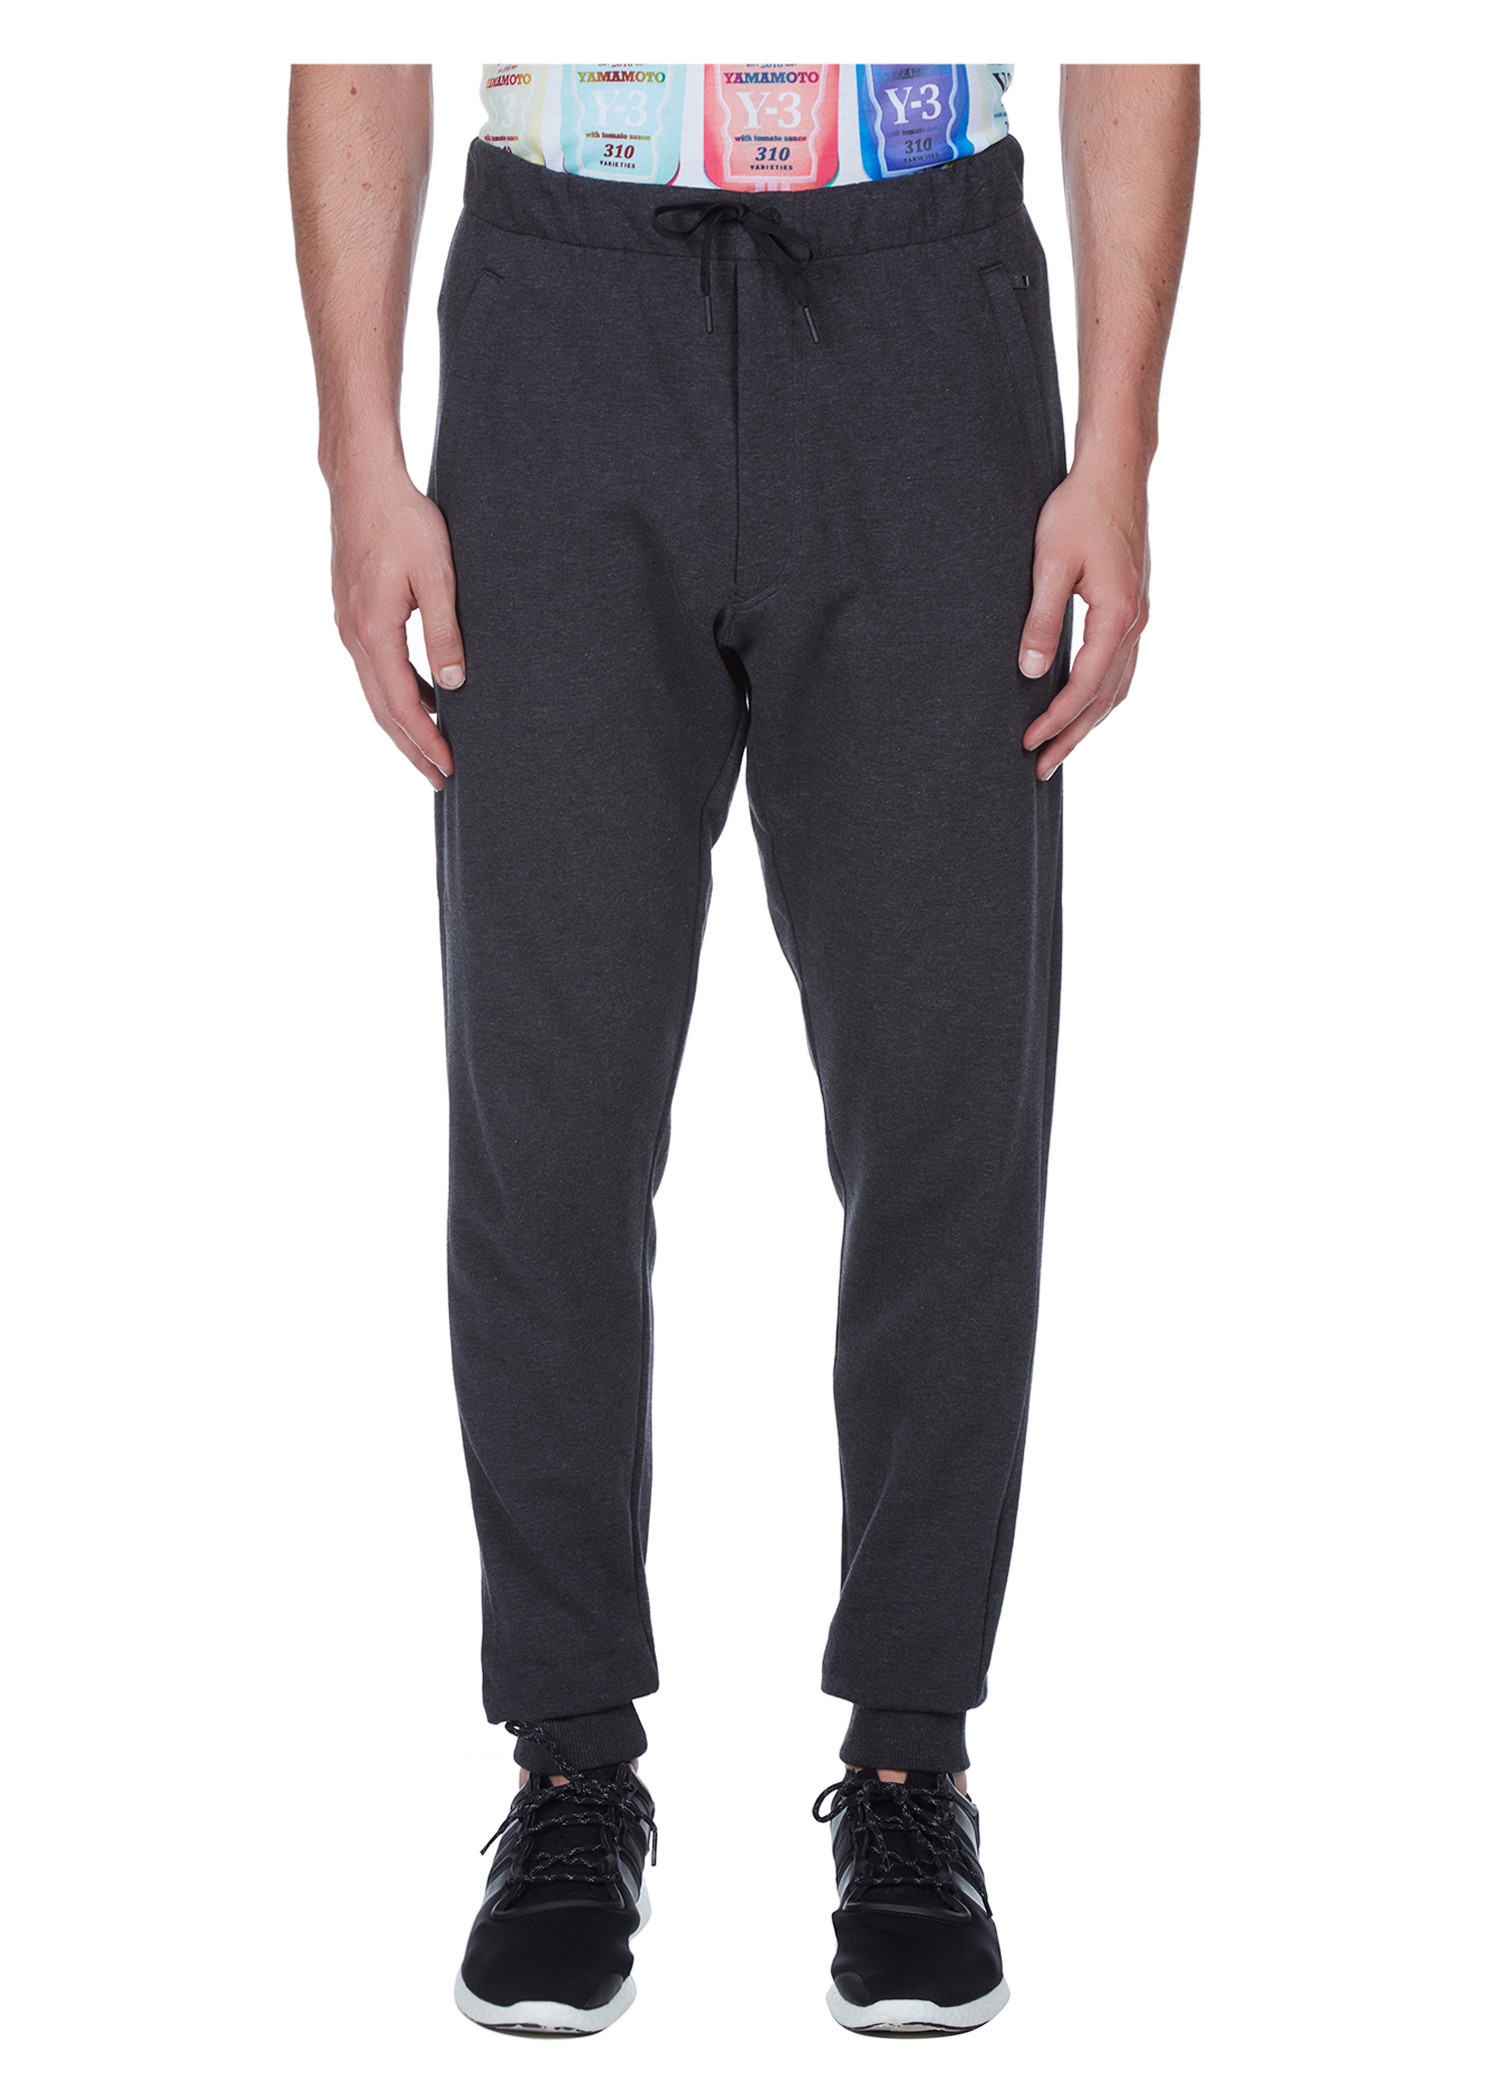 Y-3 Cl Track Pants In Charcoal Melange